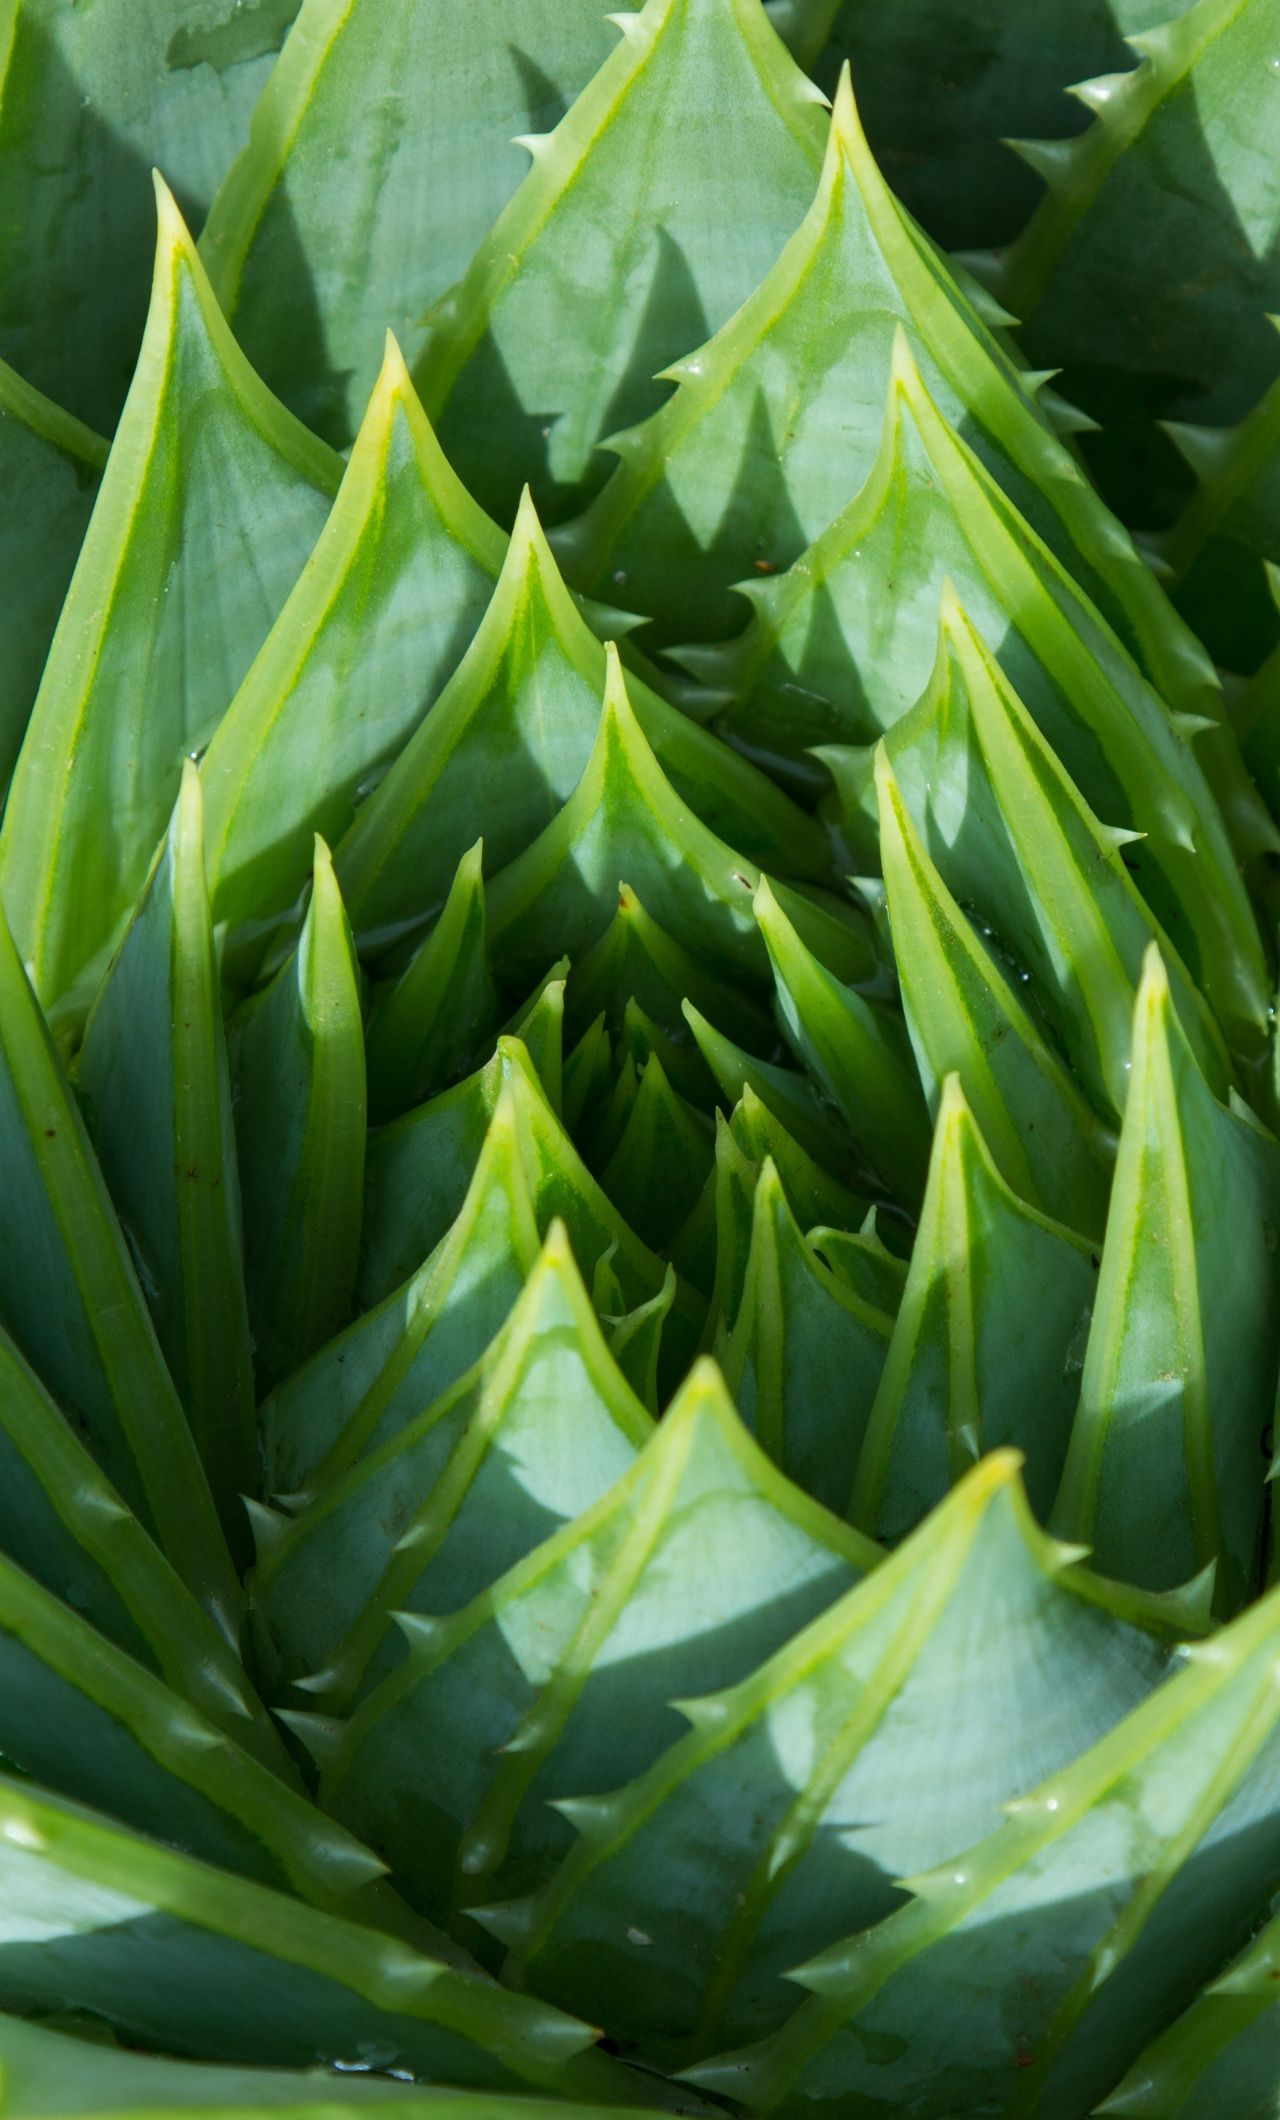 Aloe Vera, plant, green, close up, 1280x2120 wallpaper